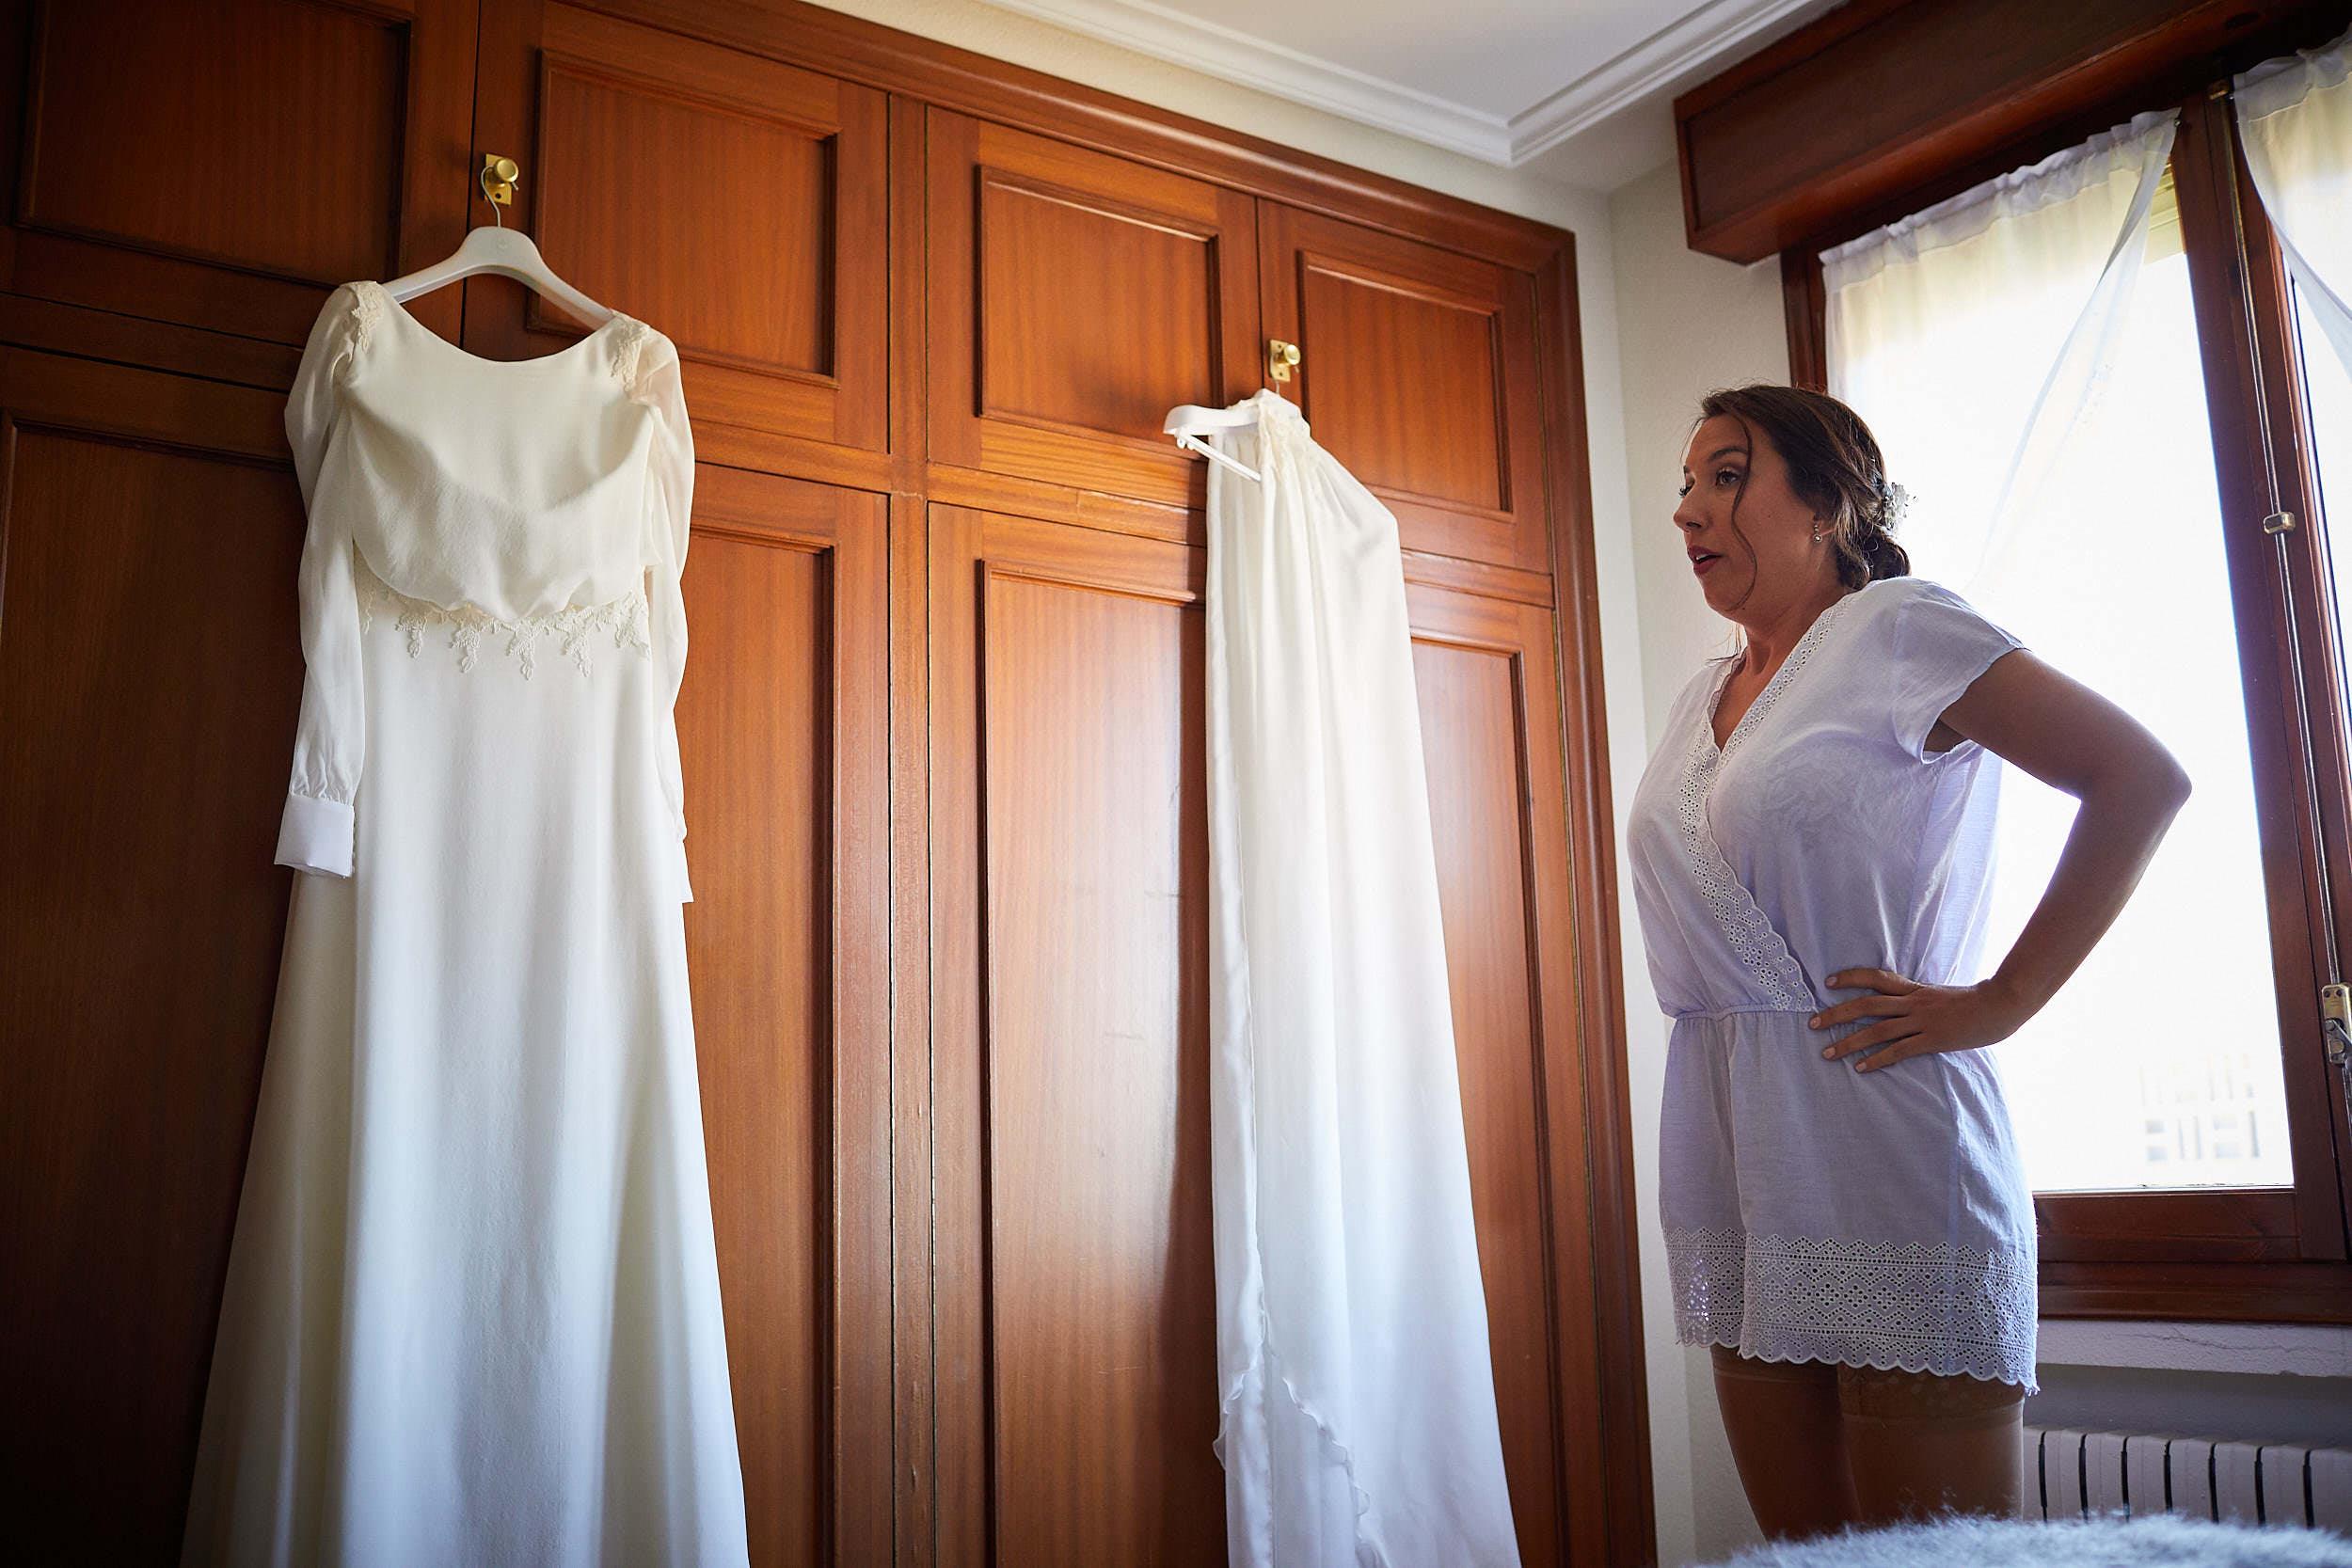 Rioja Wedding Photographer Isobel David Palacio Casafuerte Zarraton La Rioja Spain James Sturcke Photographer sturcke.org_00003.jpg